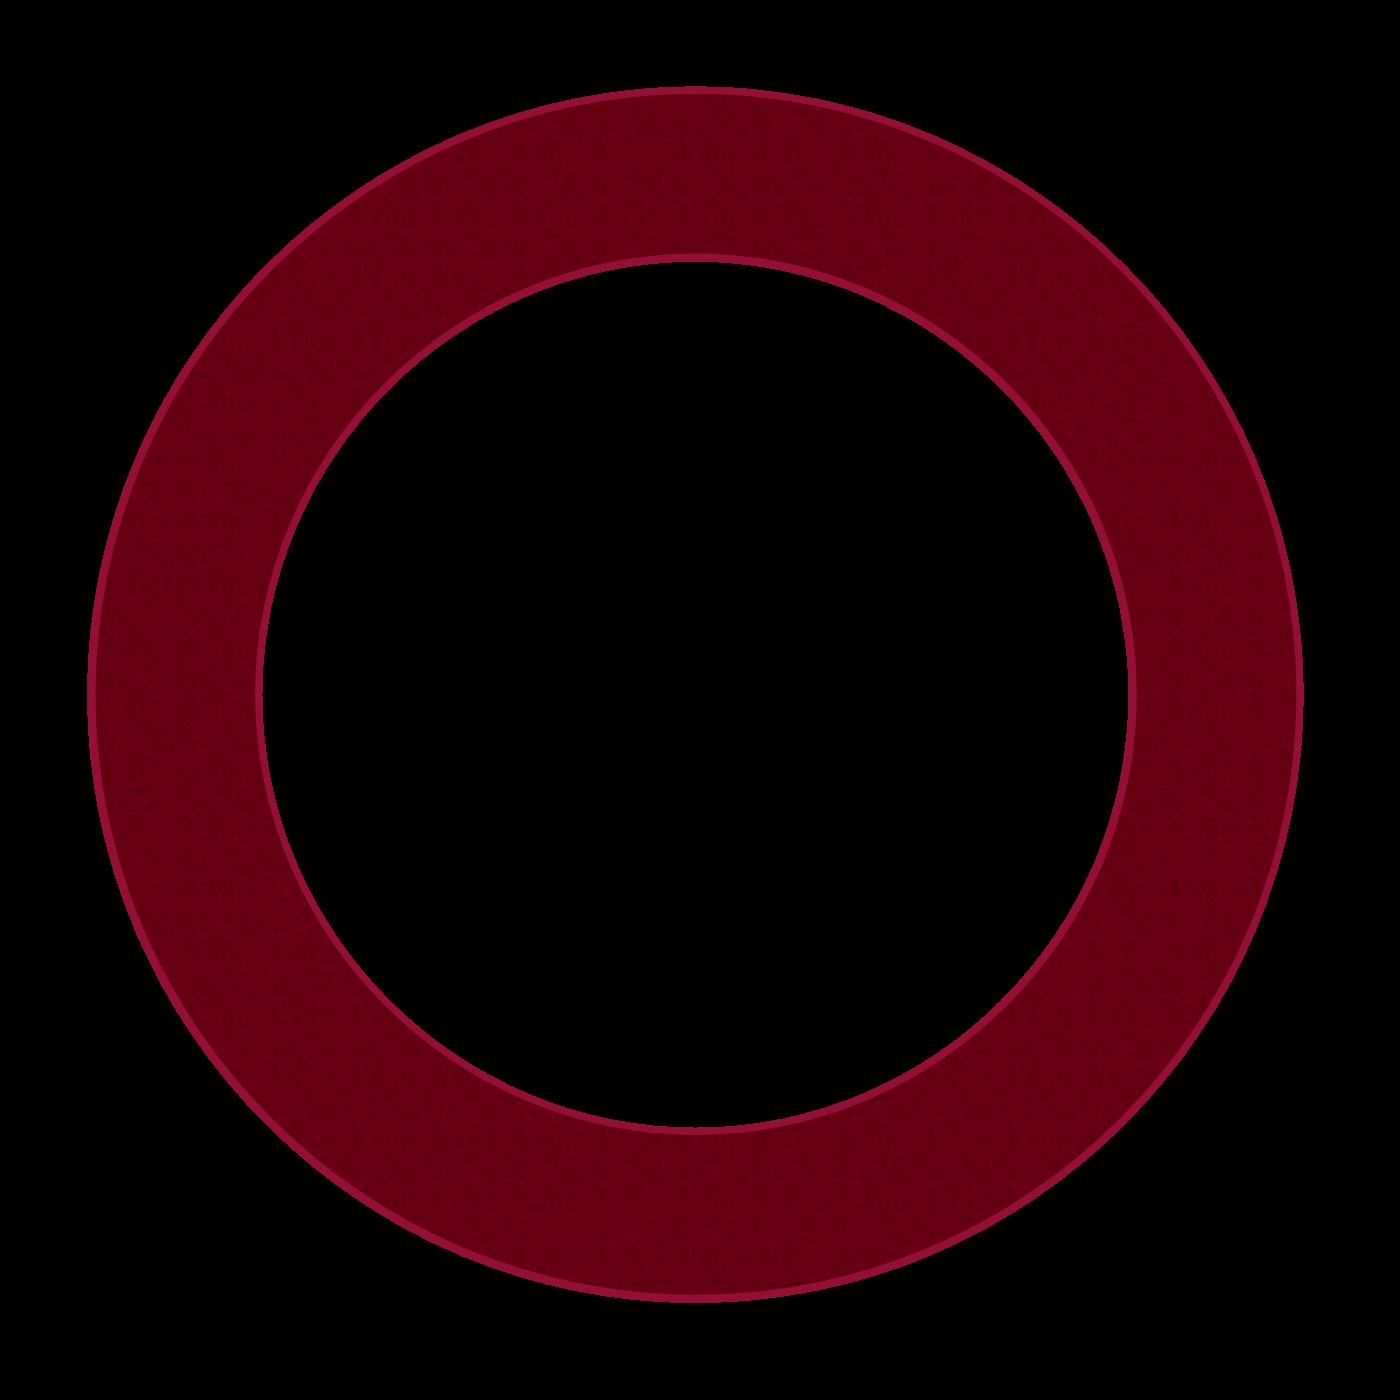 1400x1400 Circle Vector 1 An Images Hub